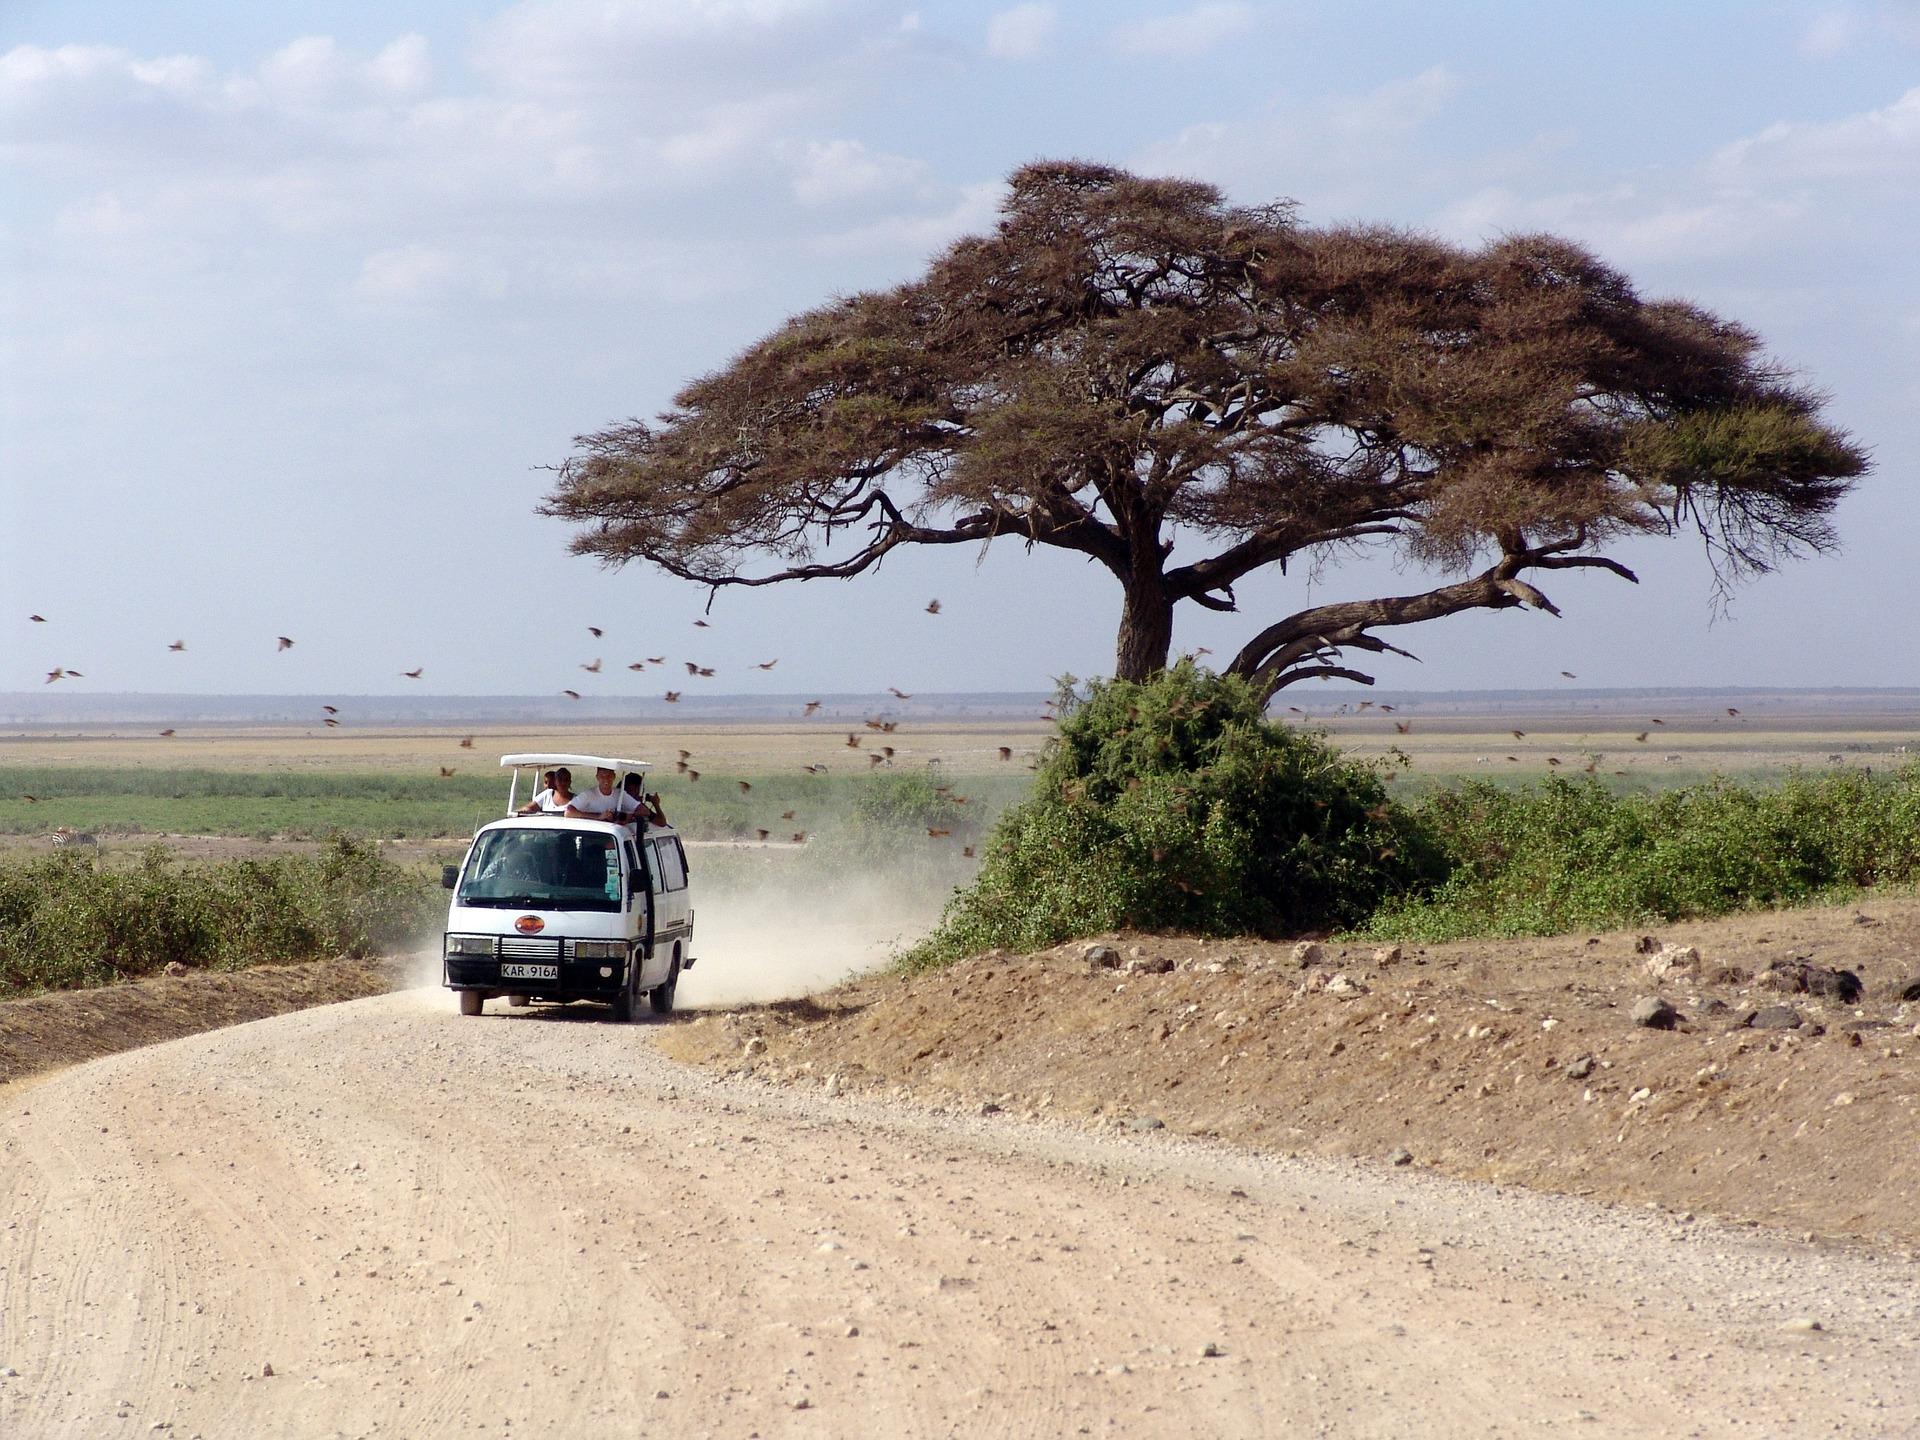 Kenya. © Peggy_Marco/PixaBay